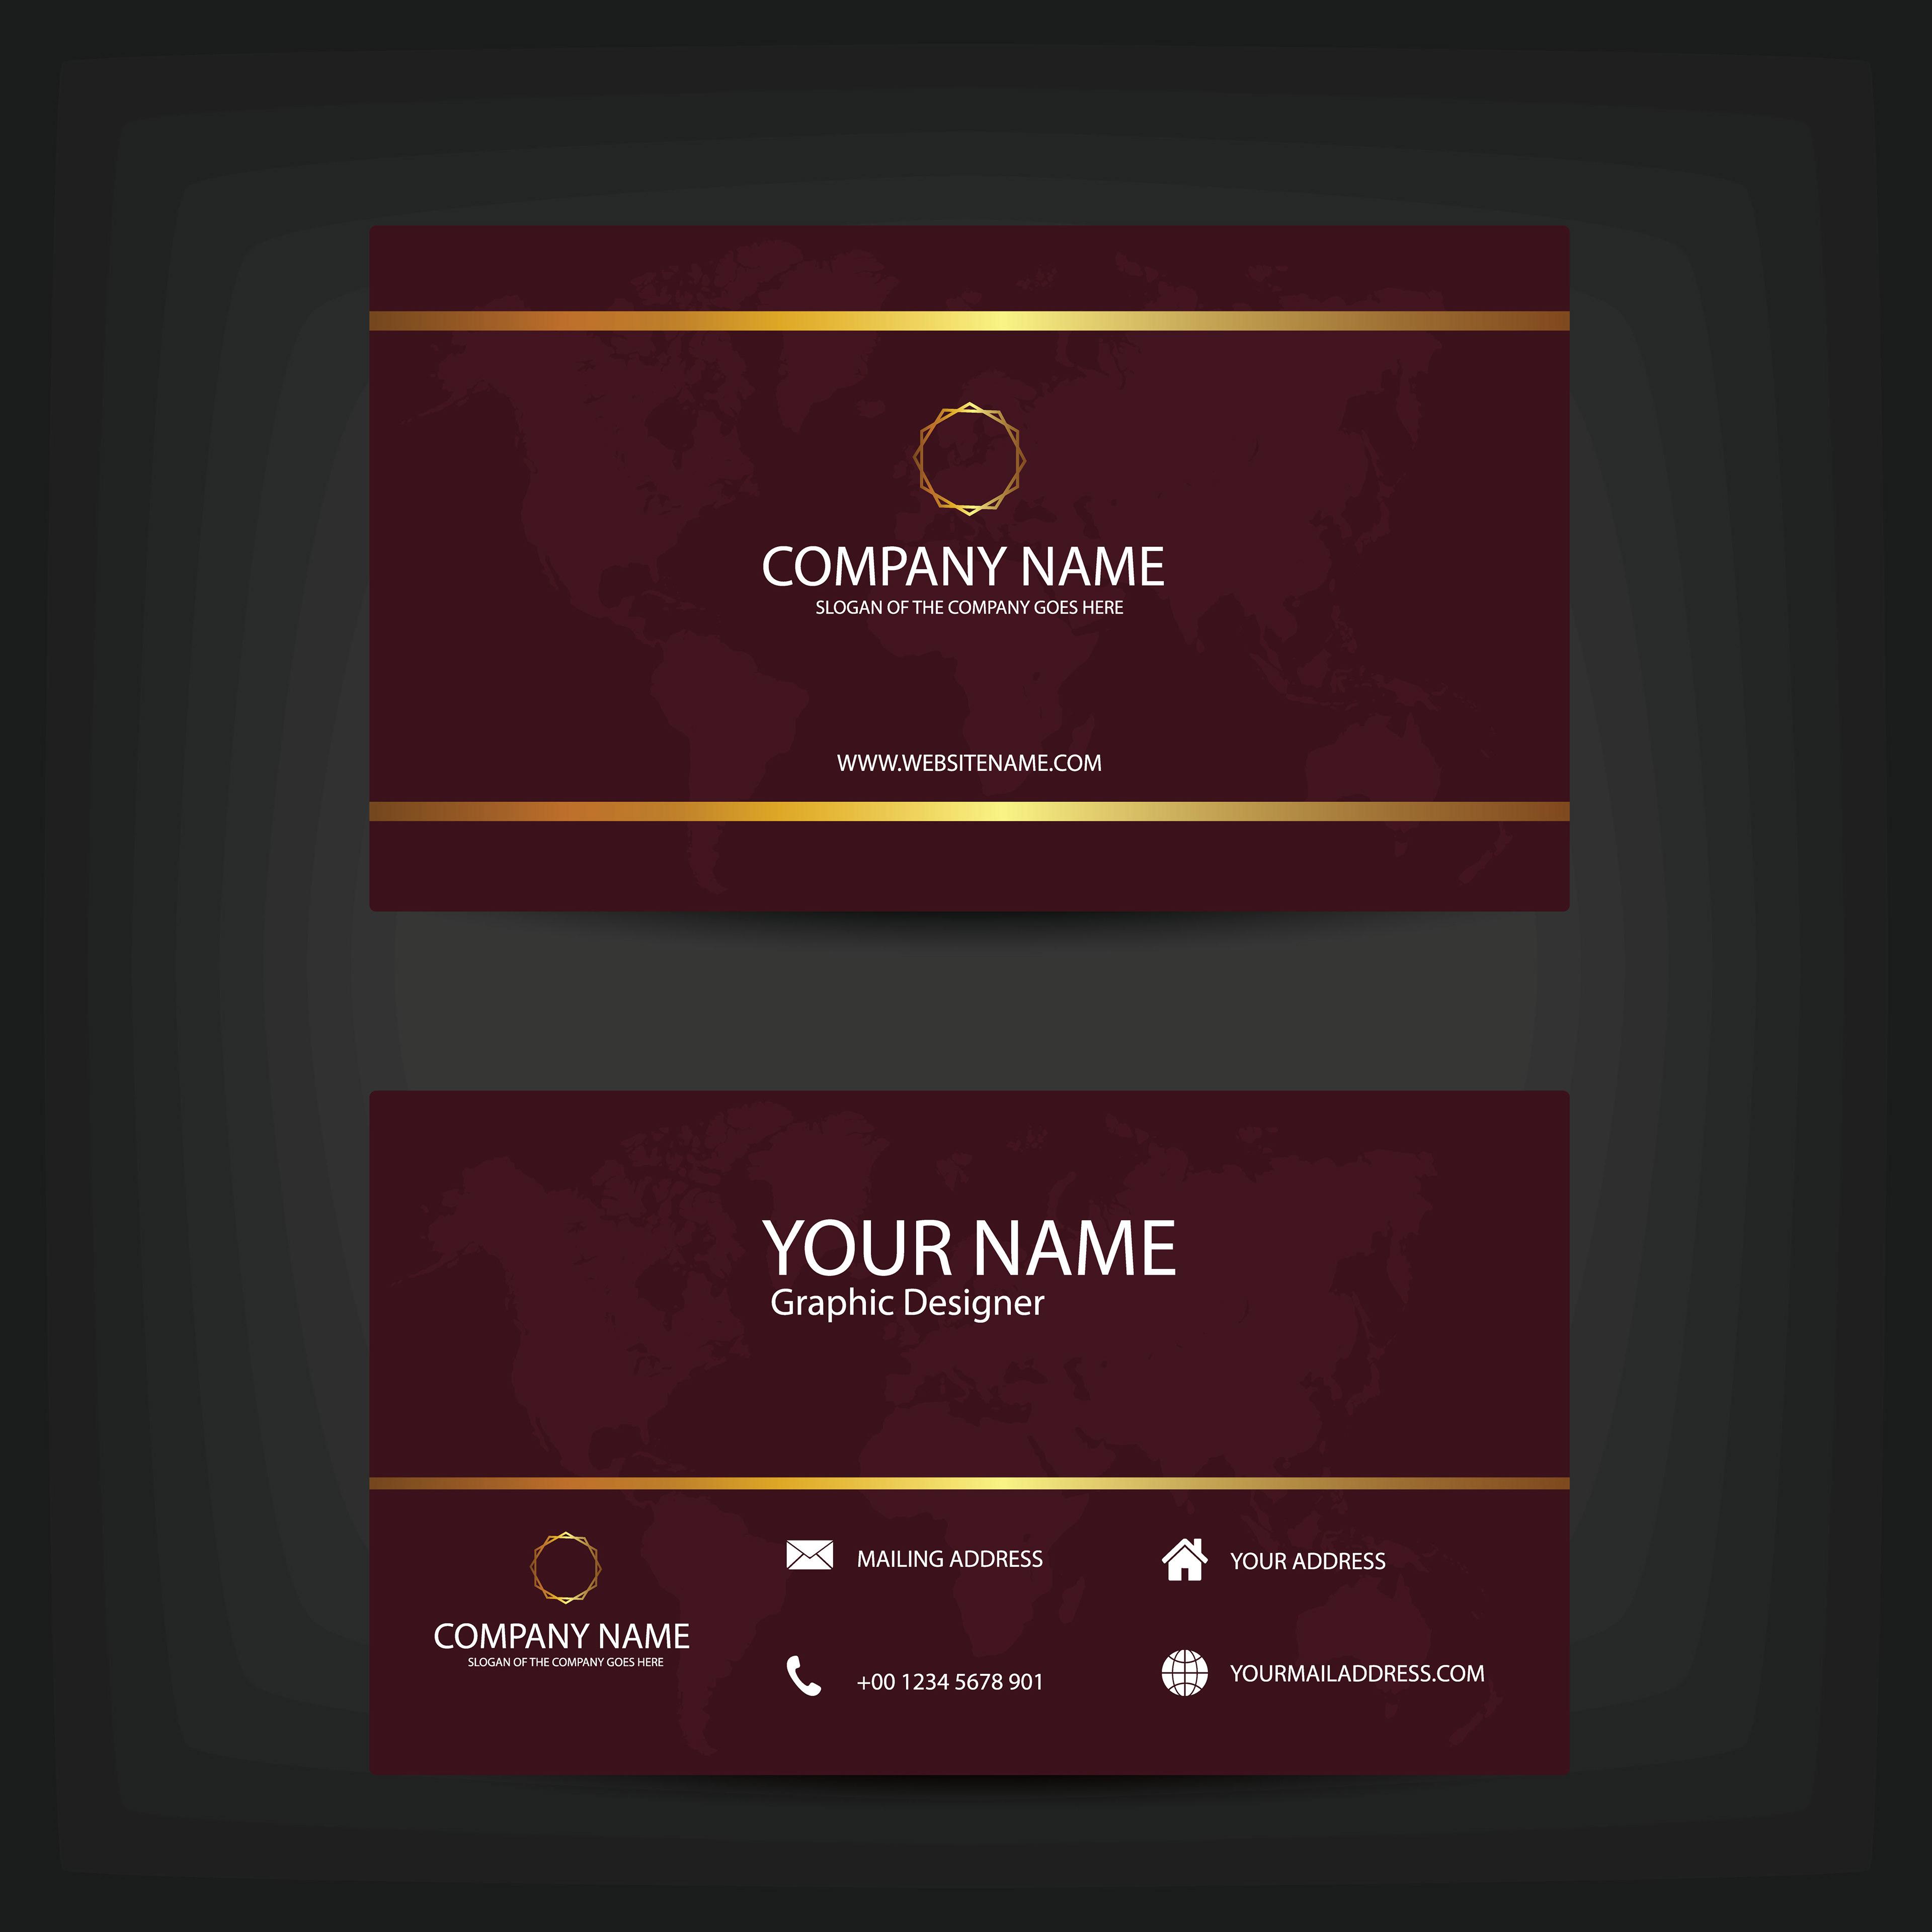 Sai Wagh Dark Modern Business Card Design Template